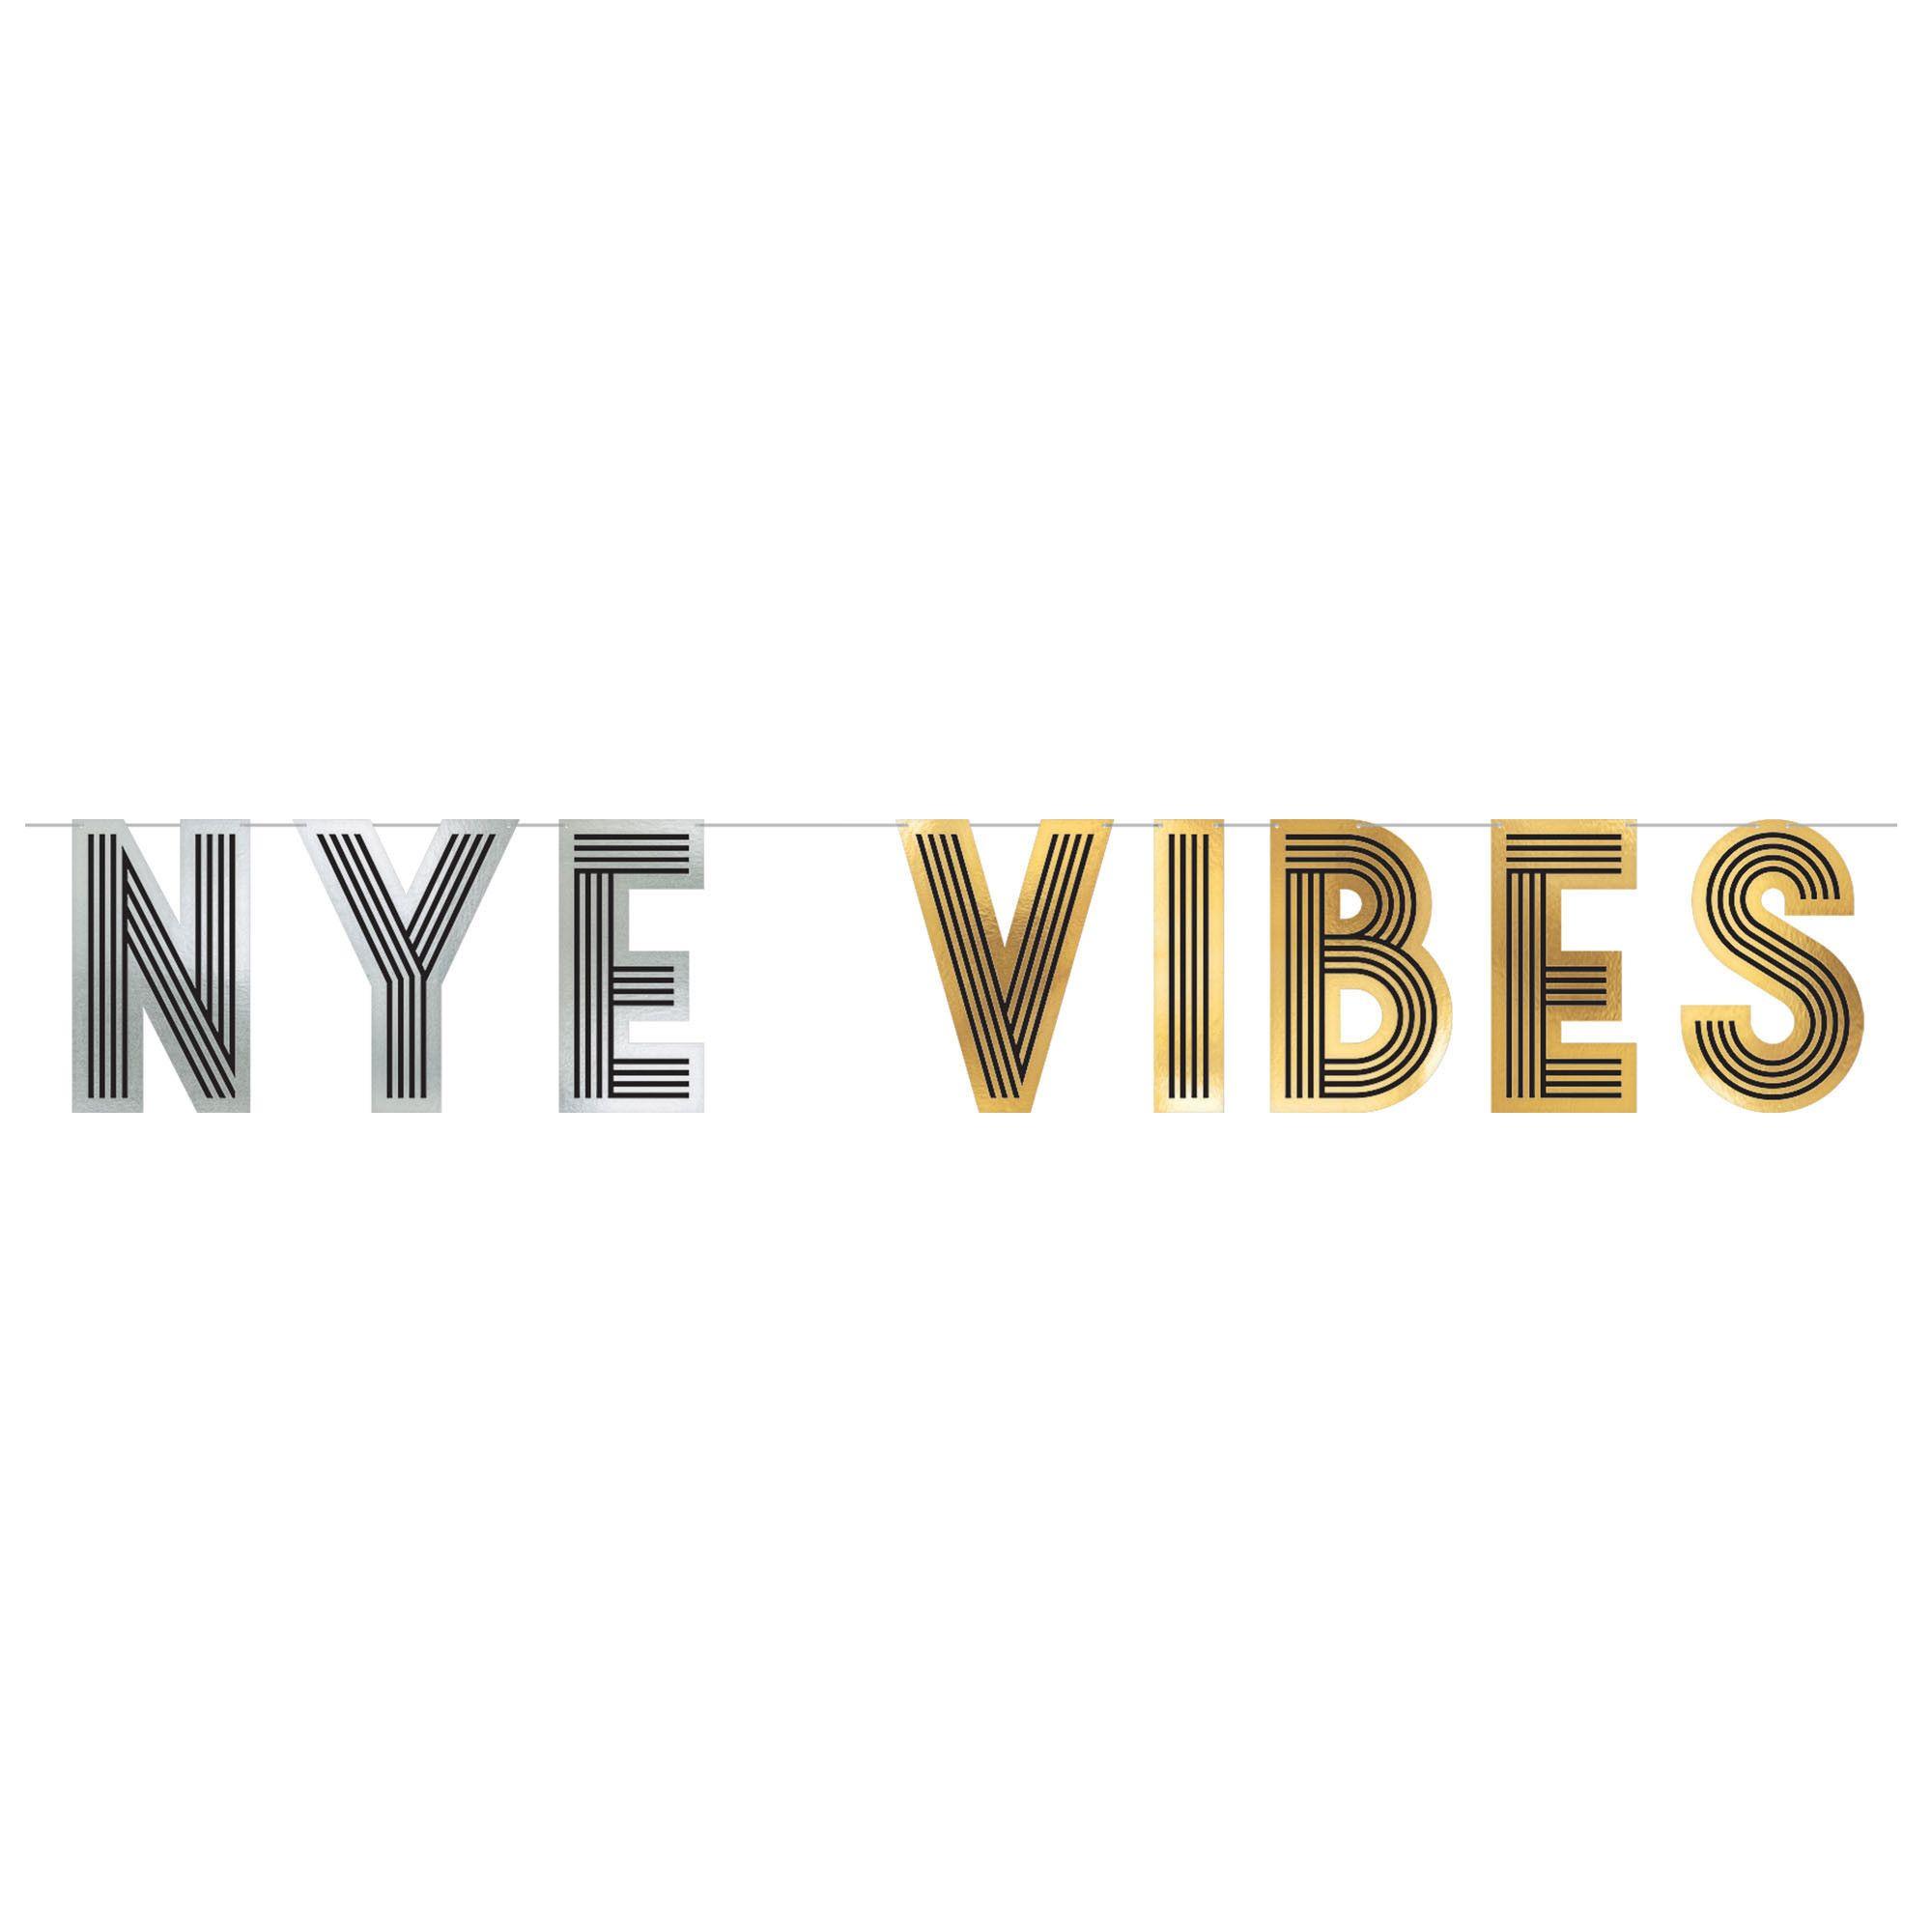 NYE Vibes Letter Banner